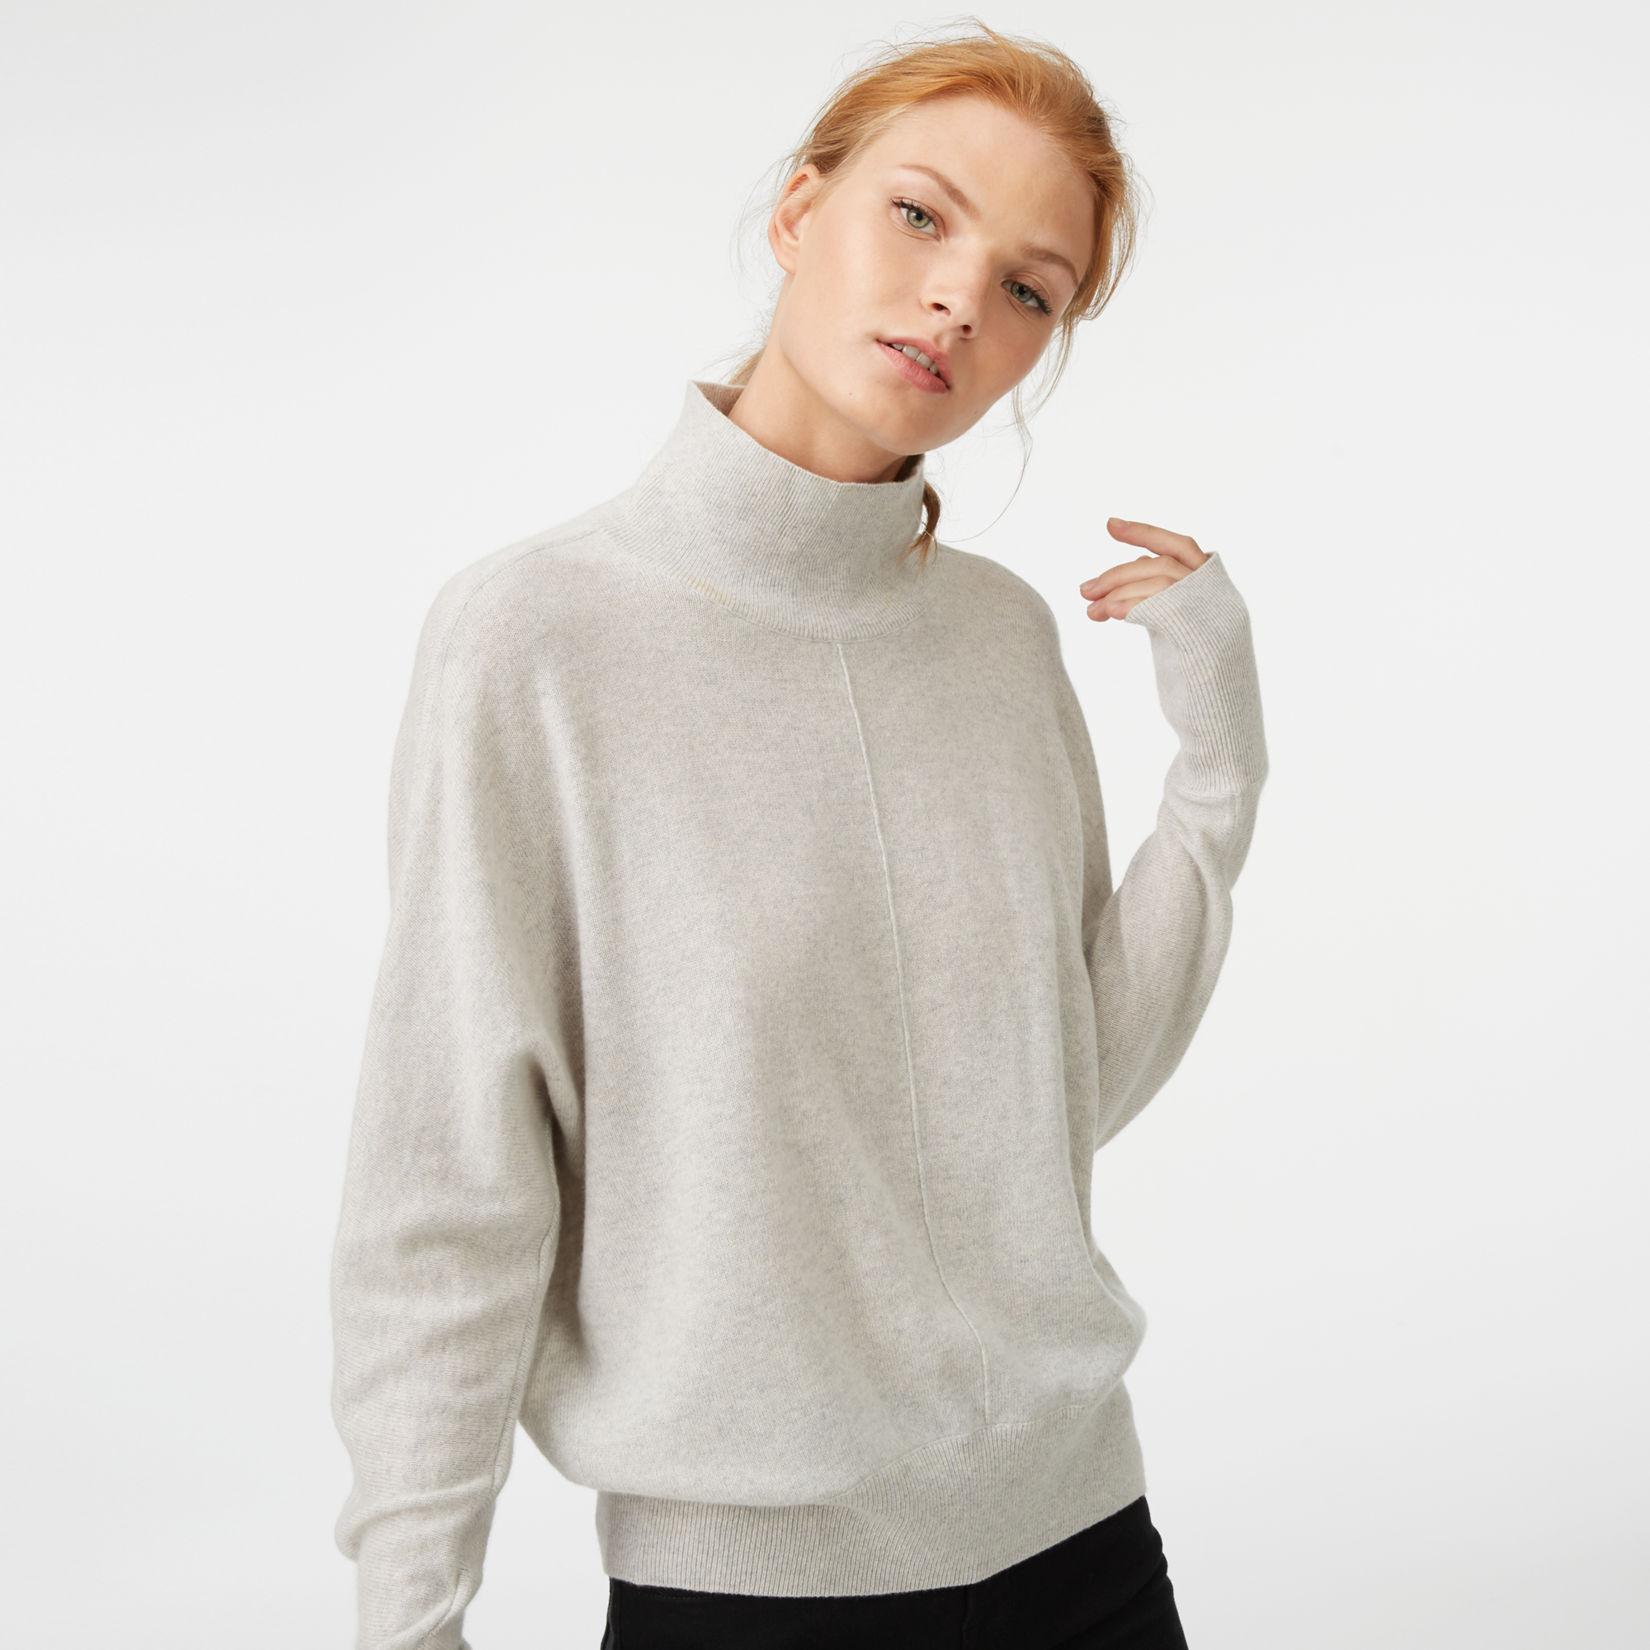 Cashmere | Women/CM/Sweaters_Cashmere/Sale | Club Monaco